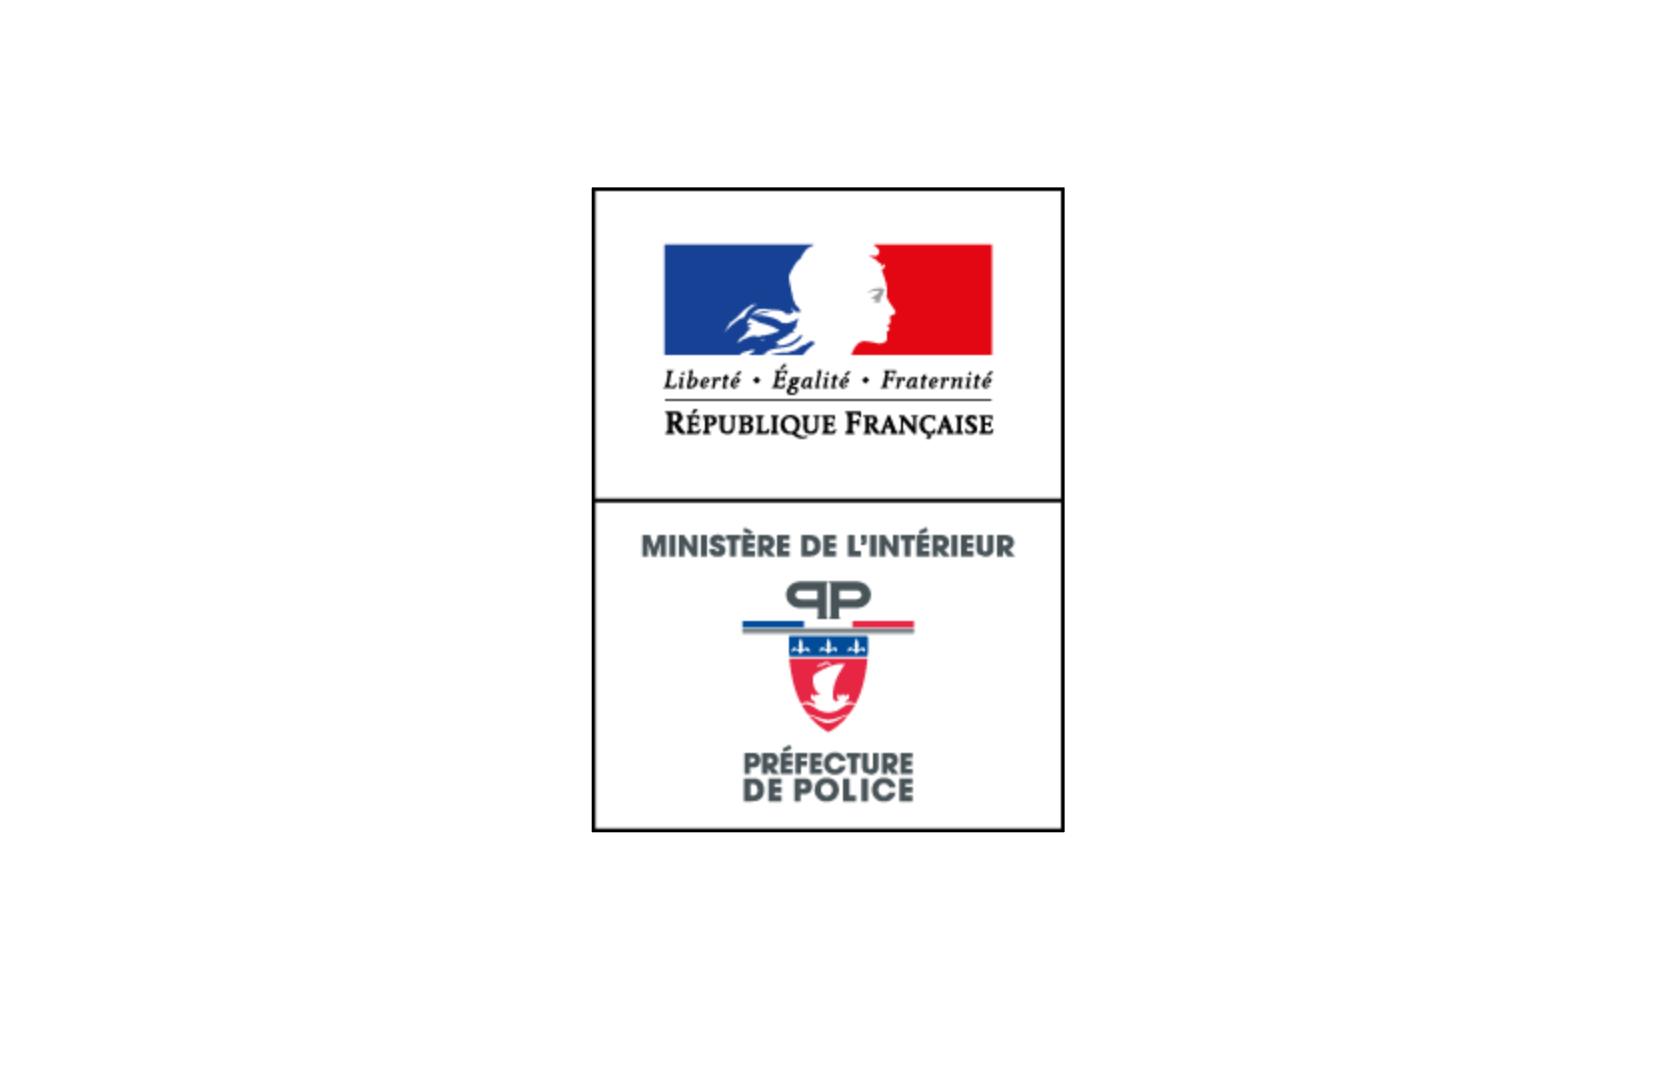 Jaguards équipera La Préfecture de Police de Paris